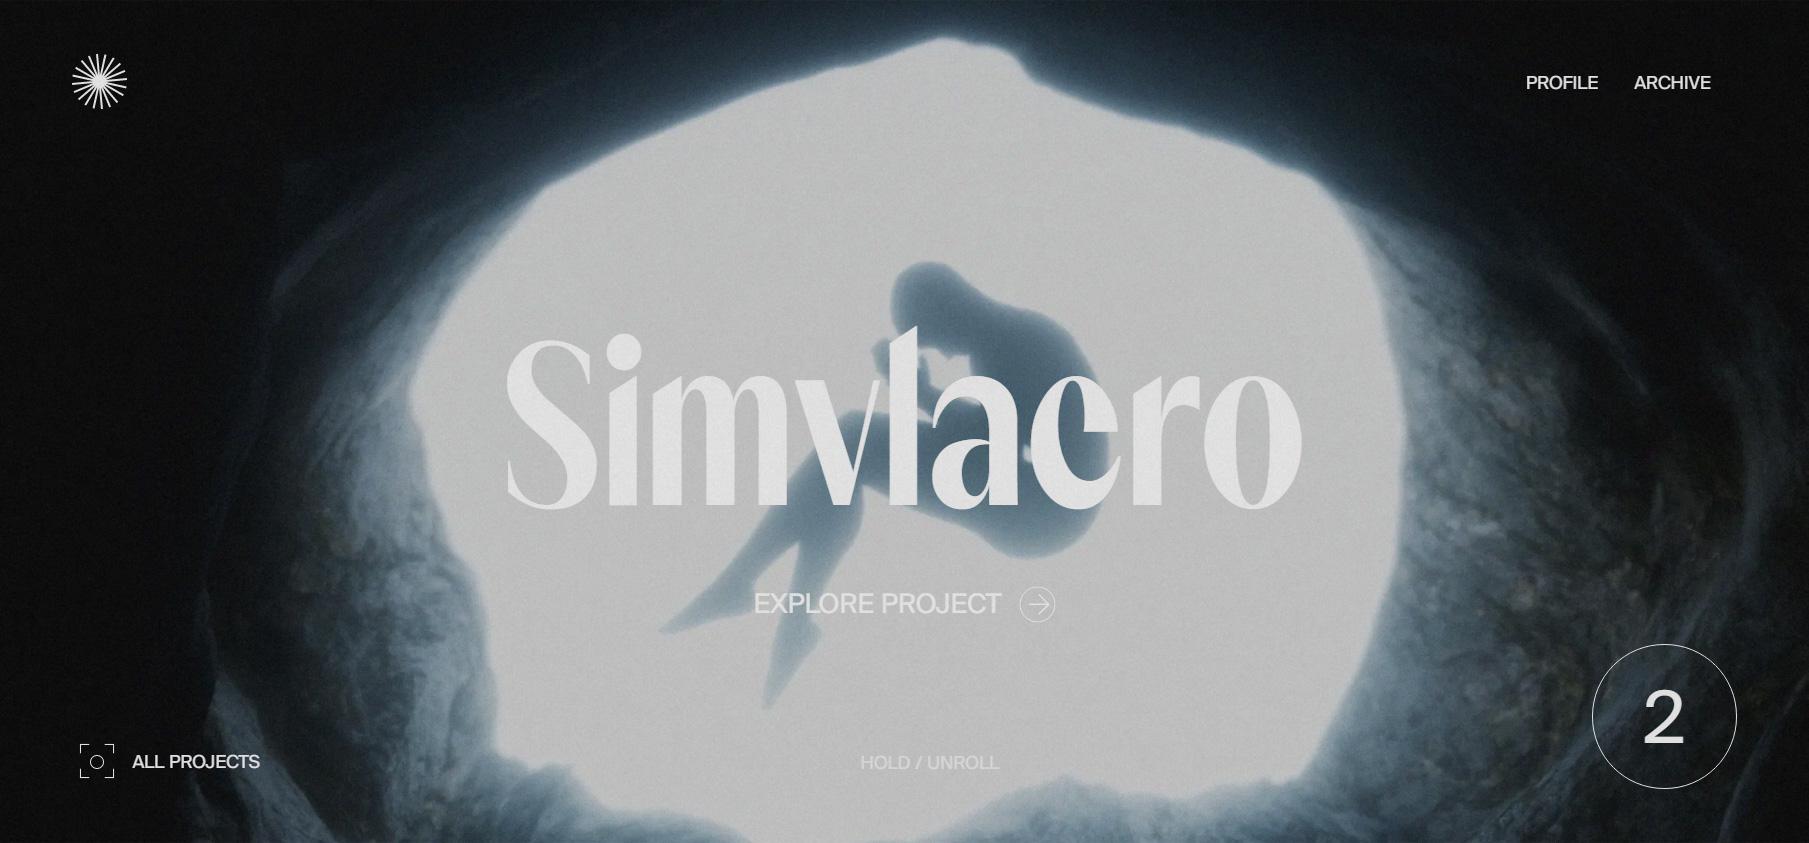 Edoardo Smerilli – Film Director - Website of the Day